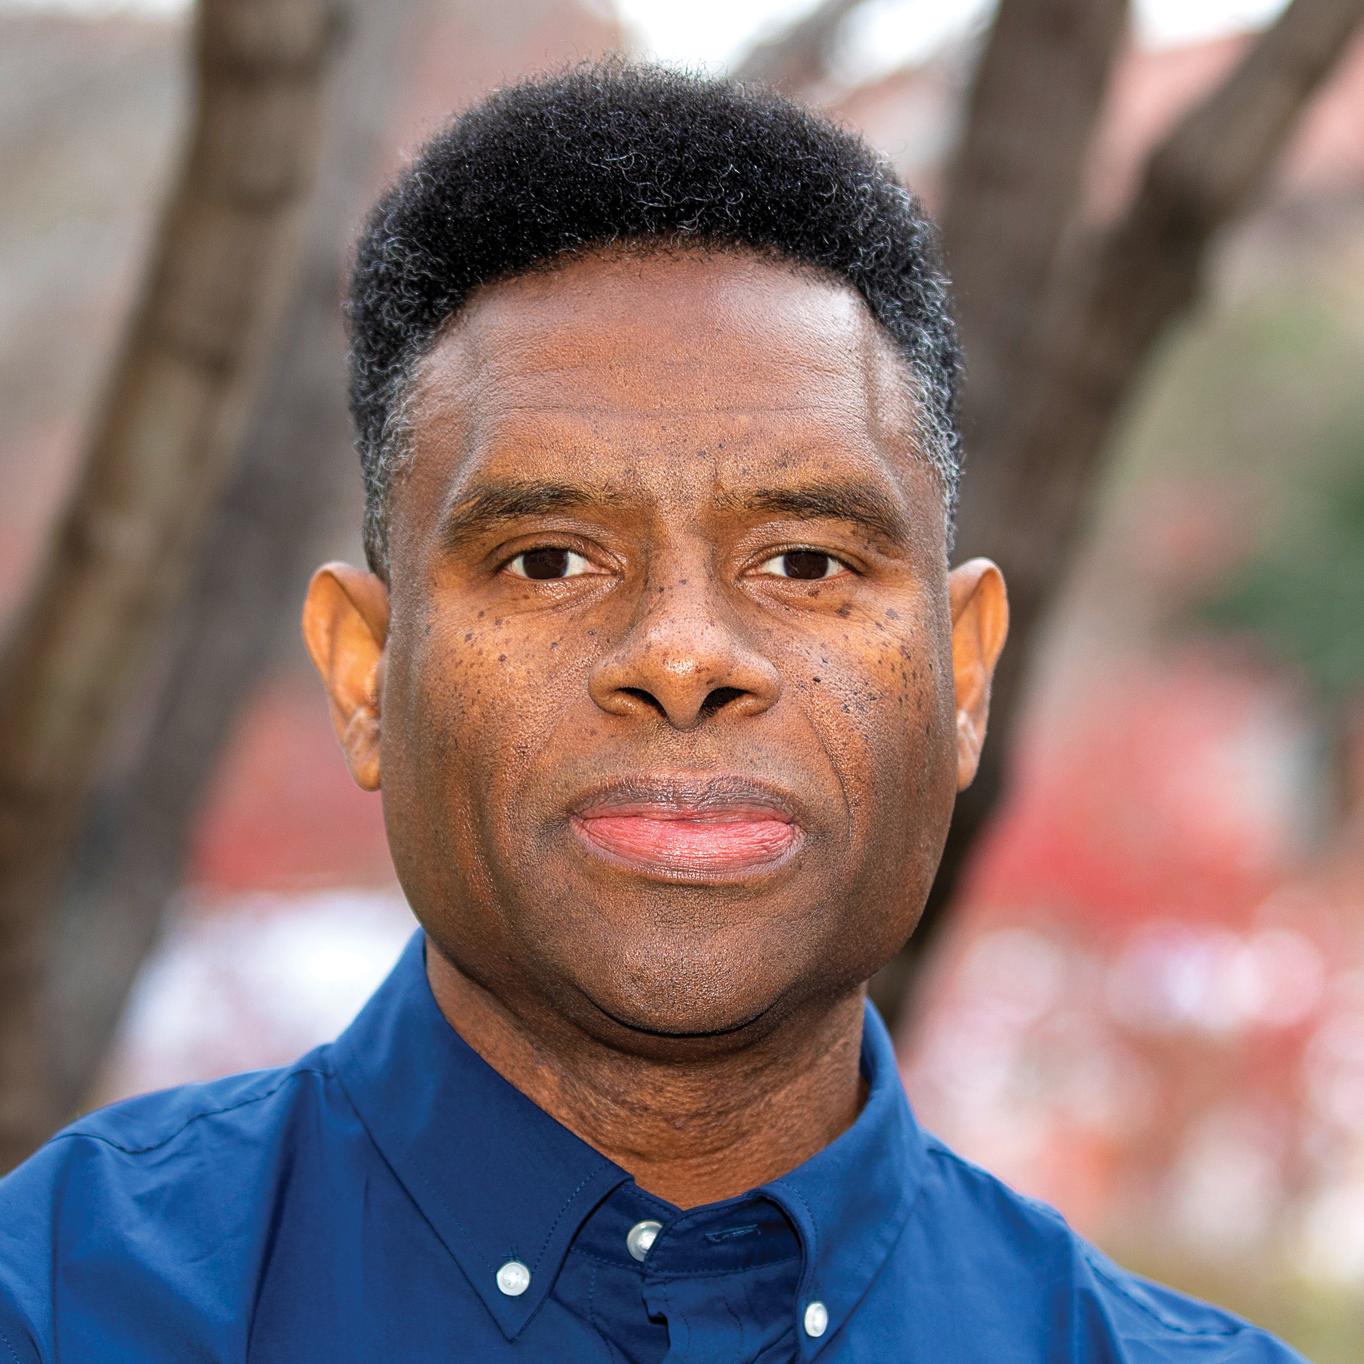 S. Craig Watkins Profile Photo